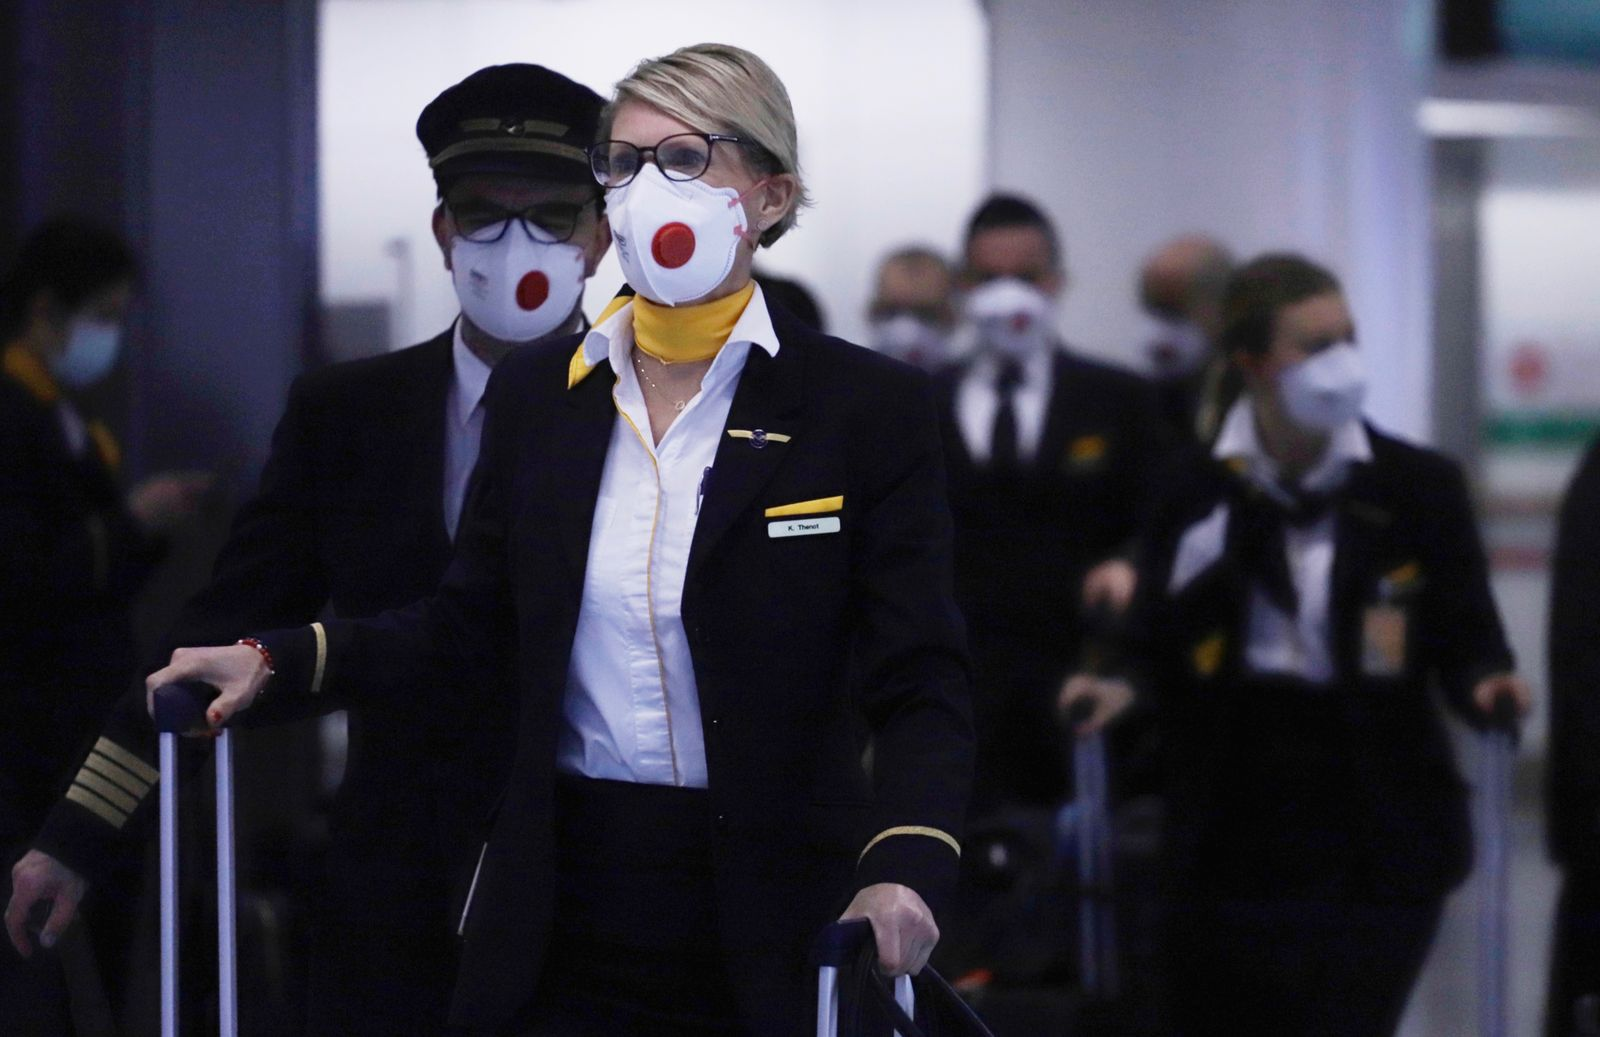 China Pneumonia Outbreak 2020 / Lufthansa masked cabin crew / HK